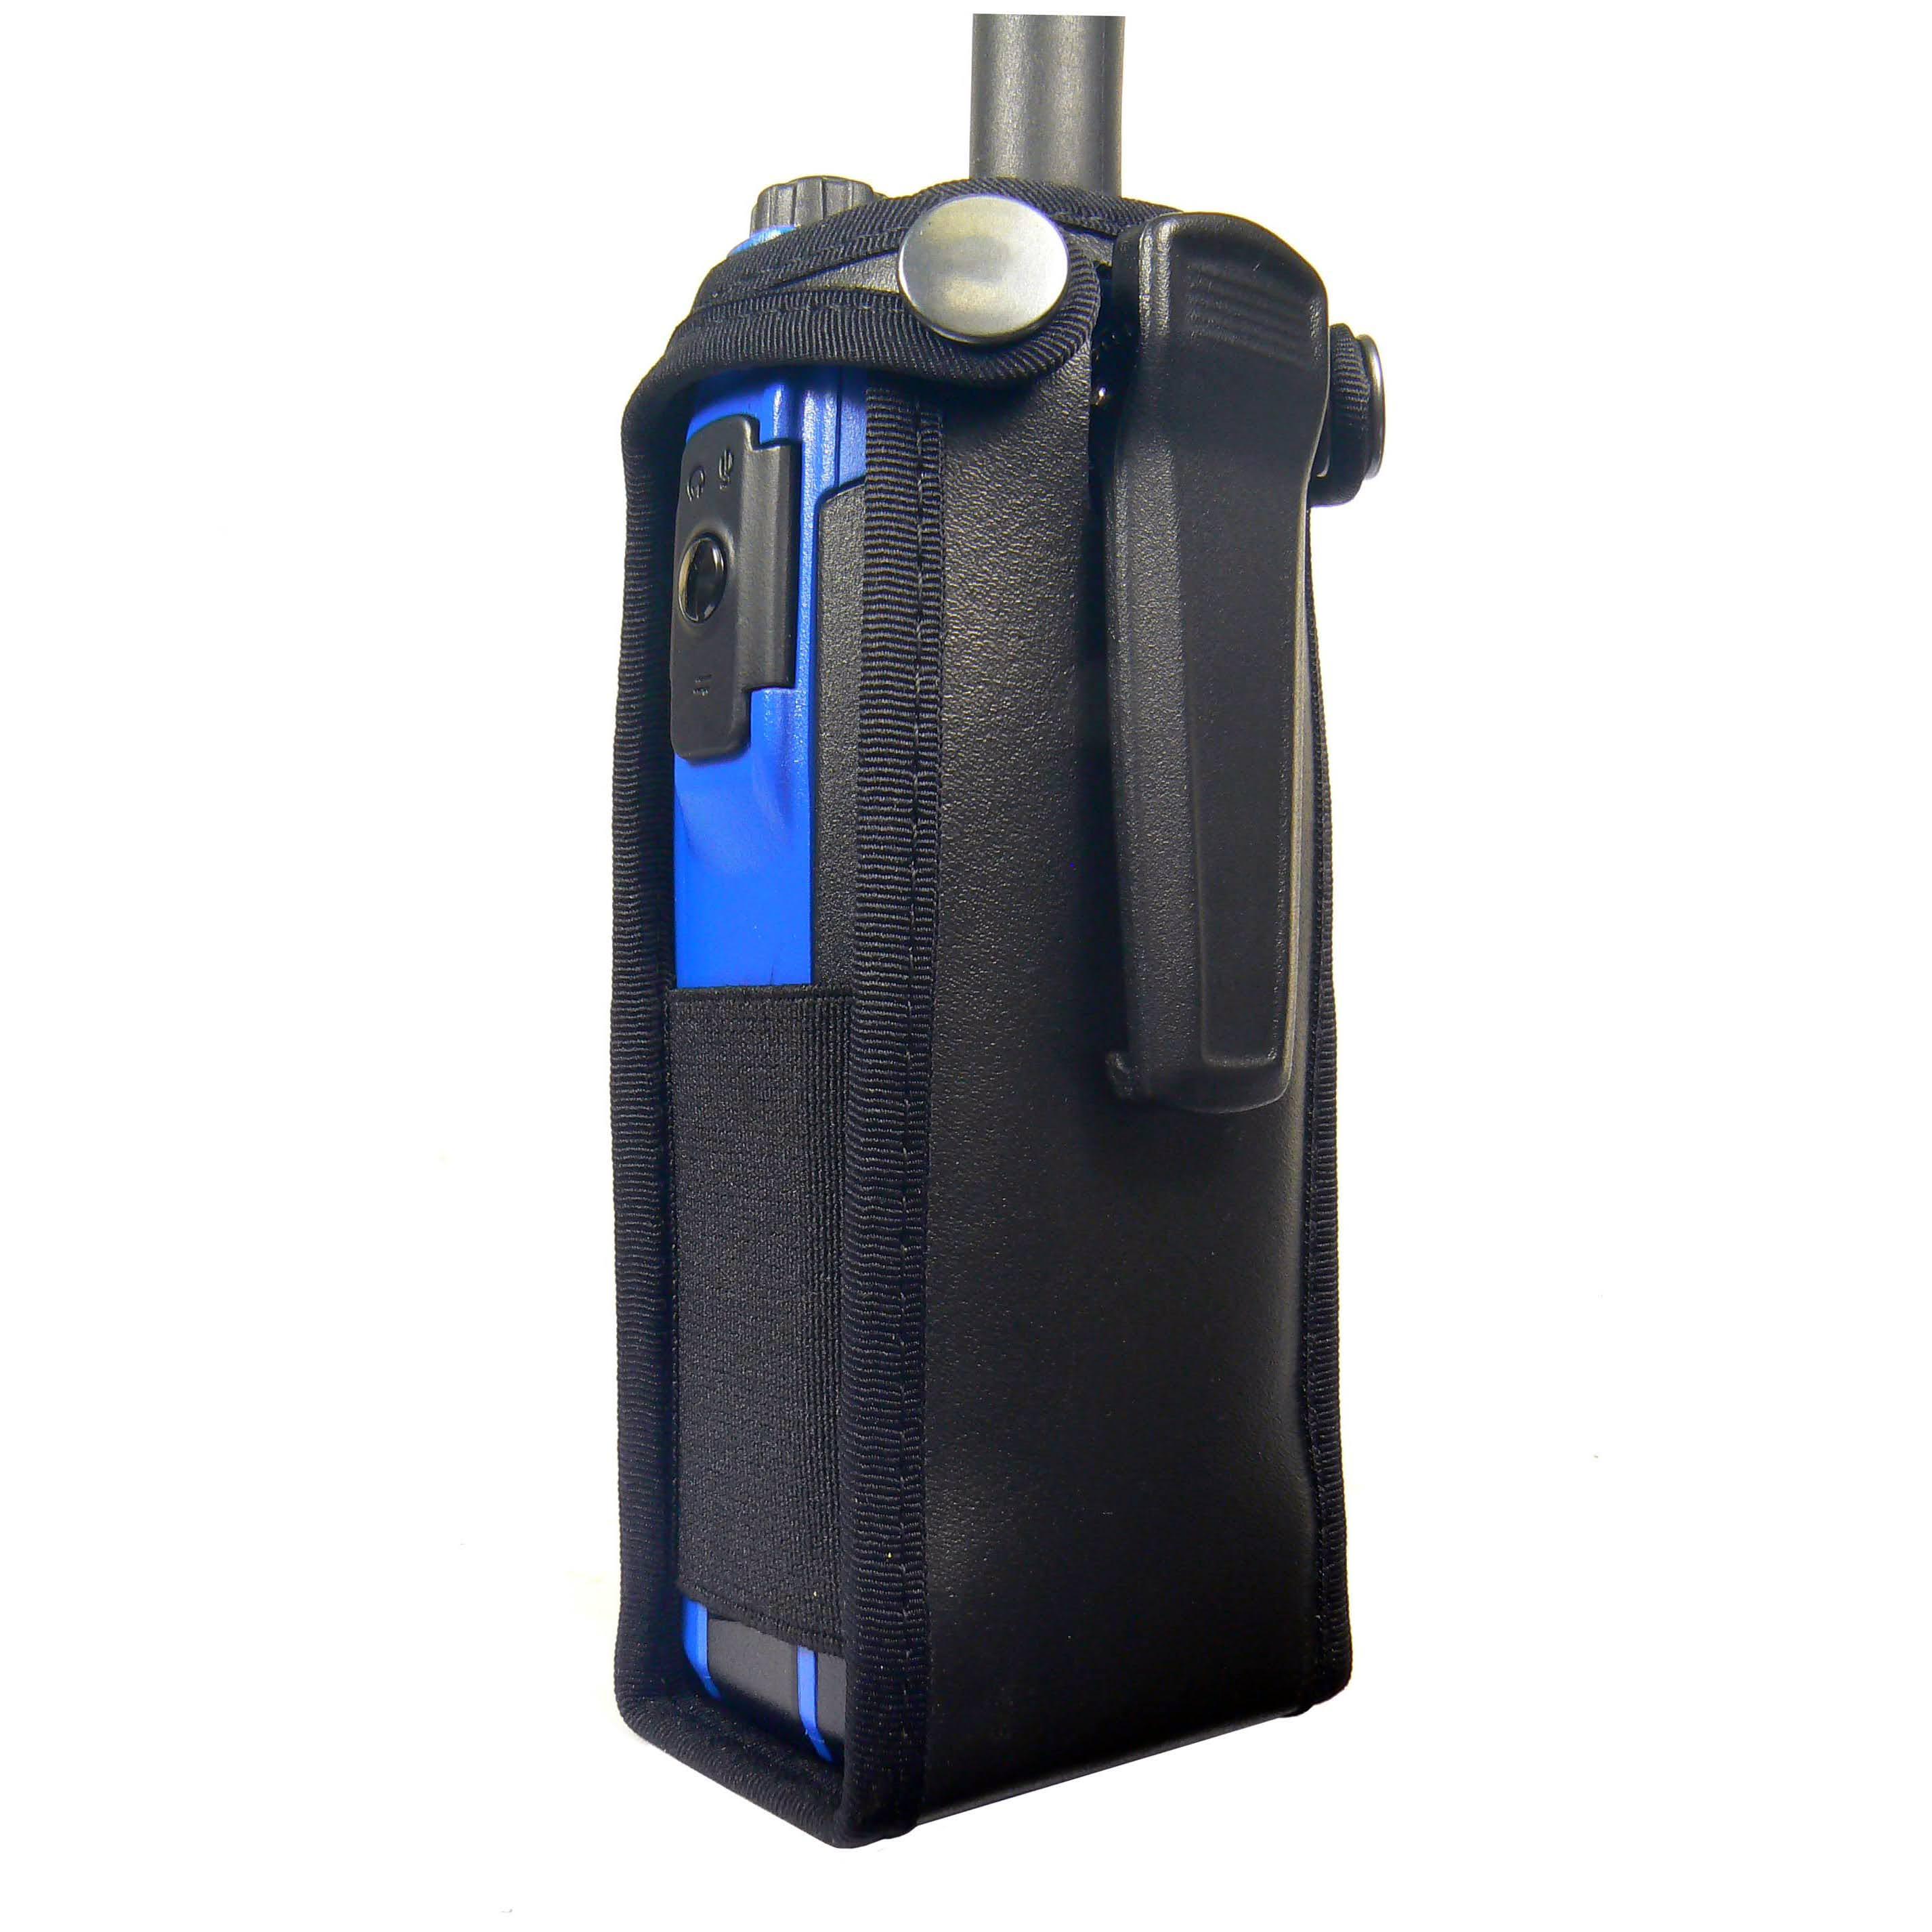 Hytera PD795 Radio Case leather